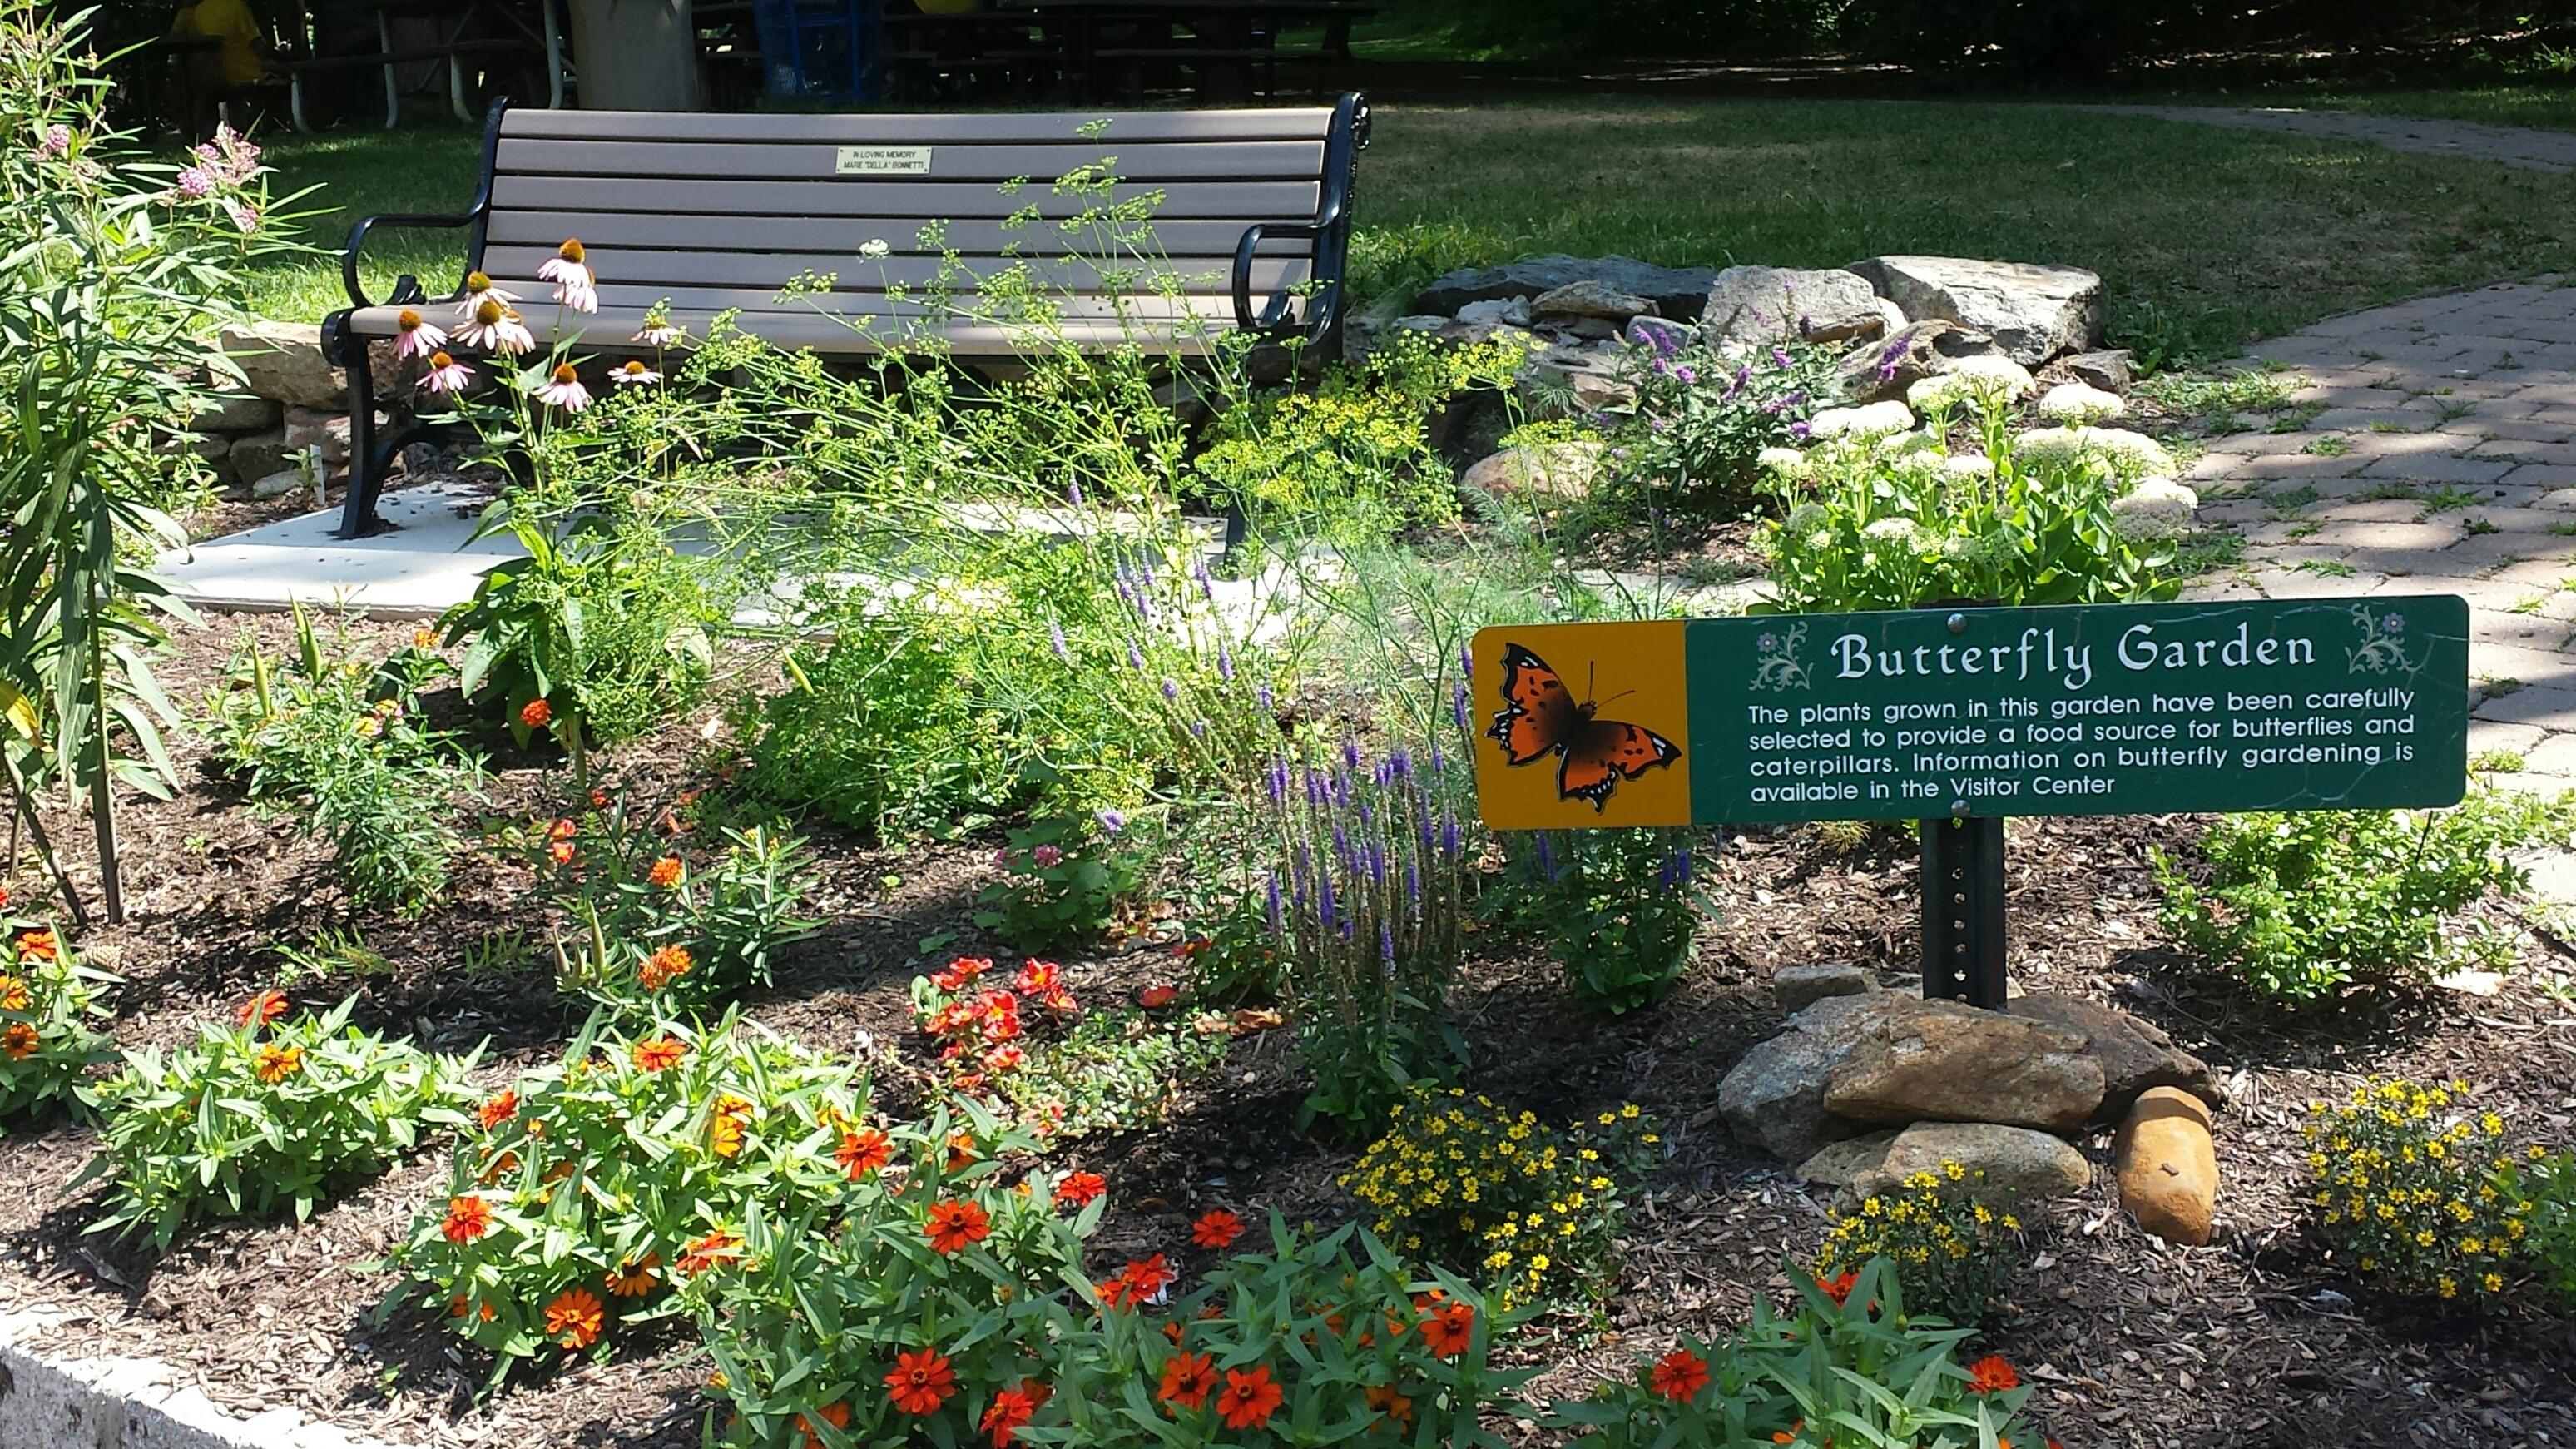 Butterfly Garden U2013 County Of Union New Jersey